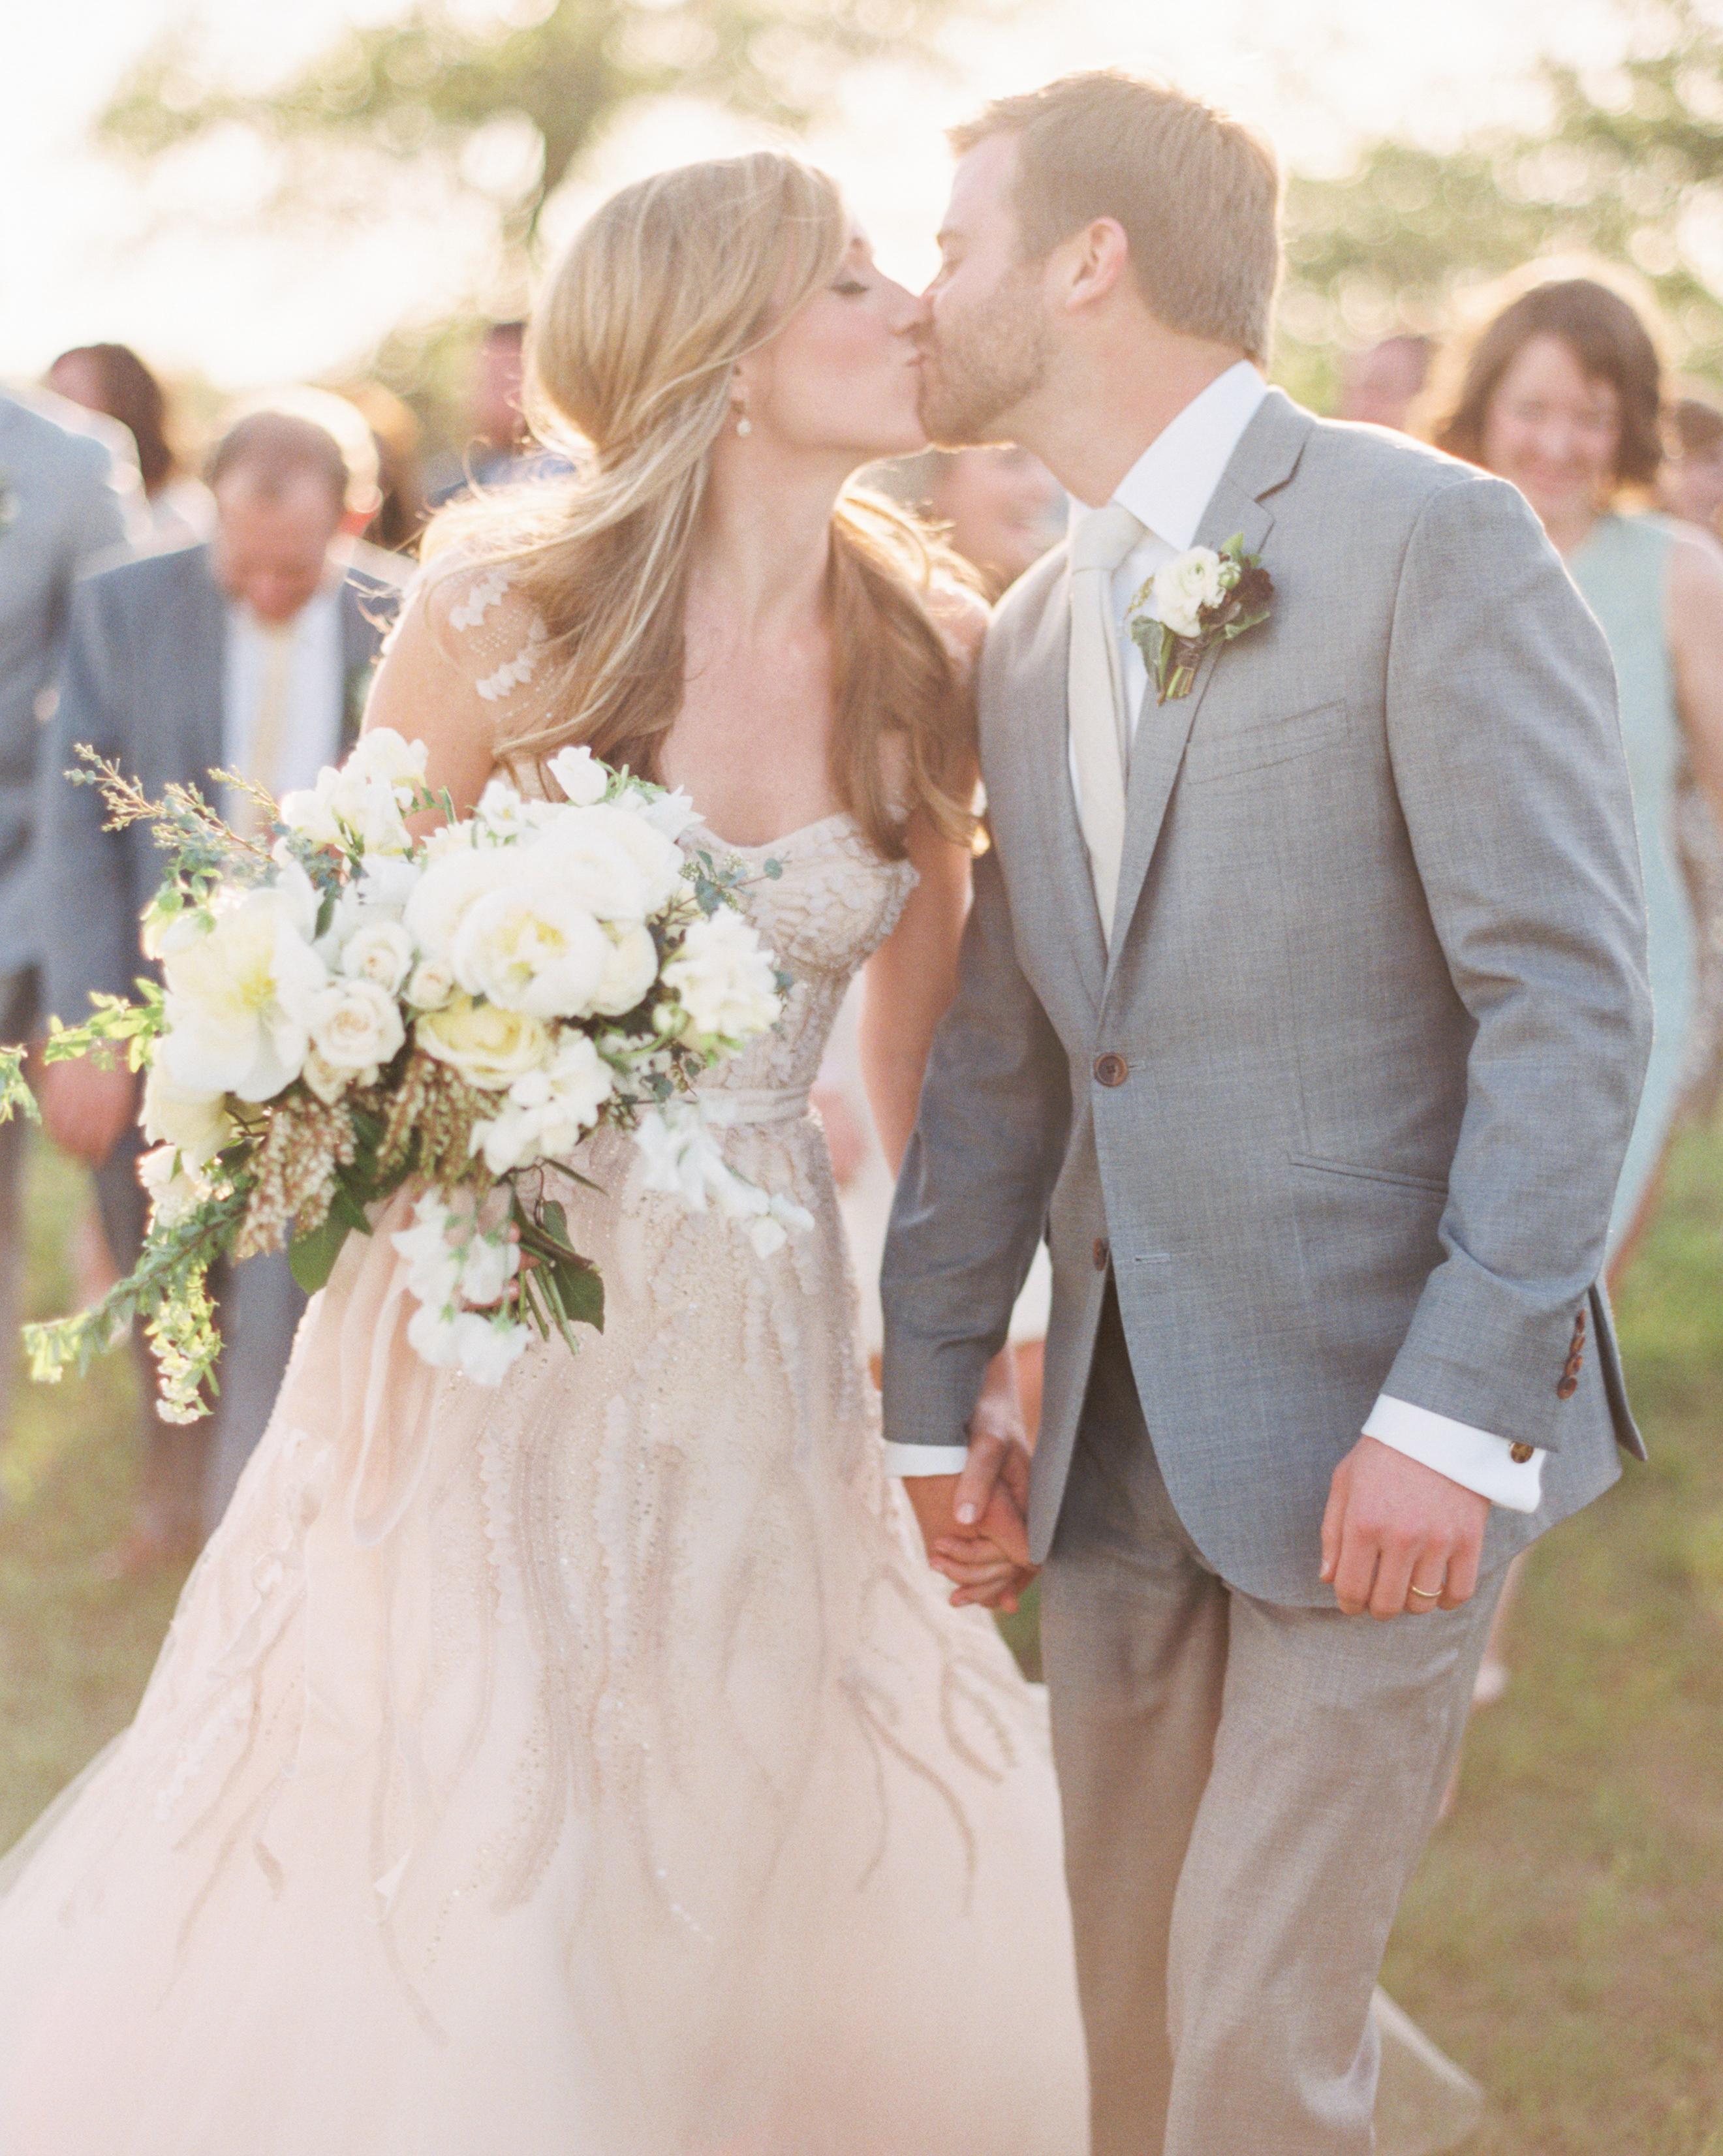 paige-chris-wedding-suite-030-s111485-0914.jpg